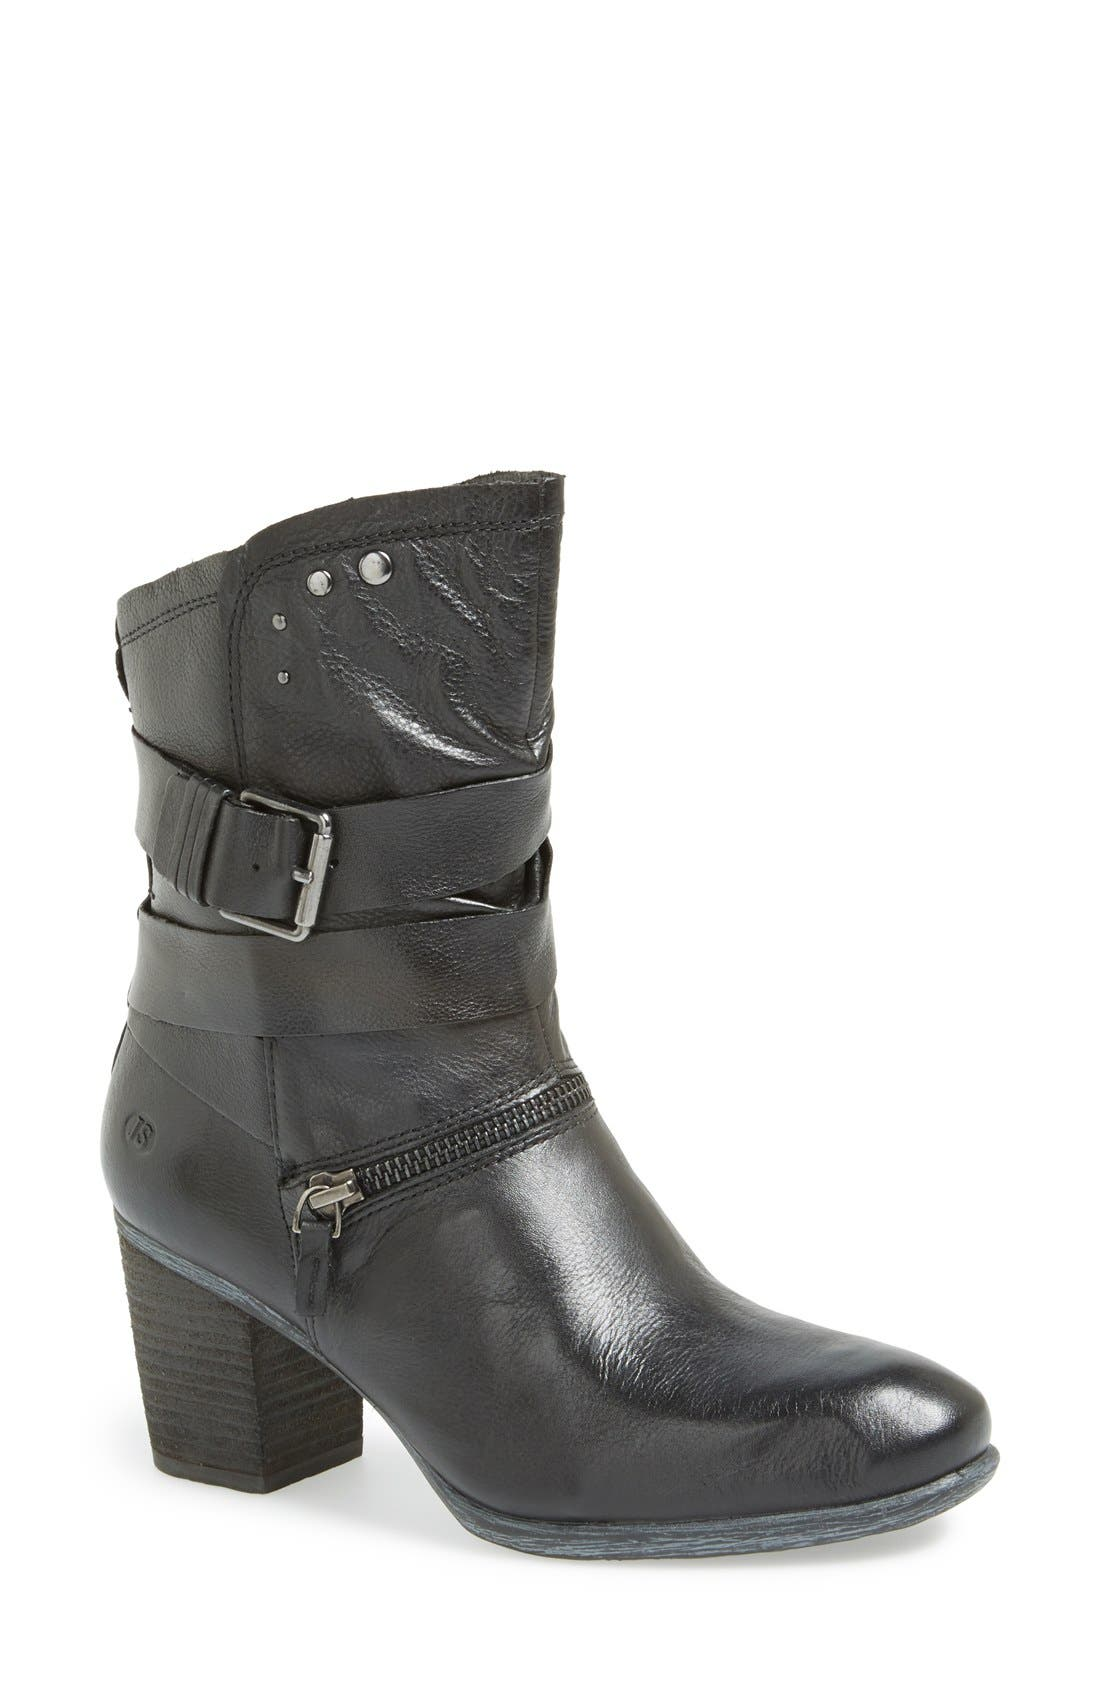 JOSEF SEIBEL 'Britney 06' Boot, Main, color, 009